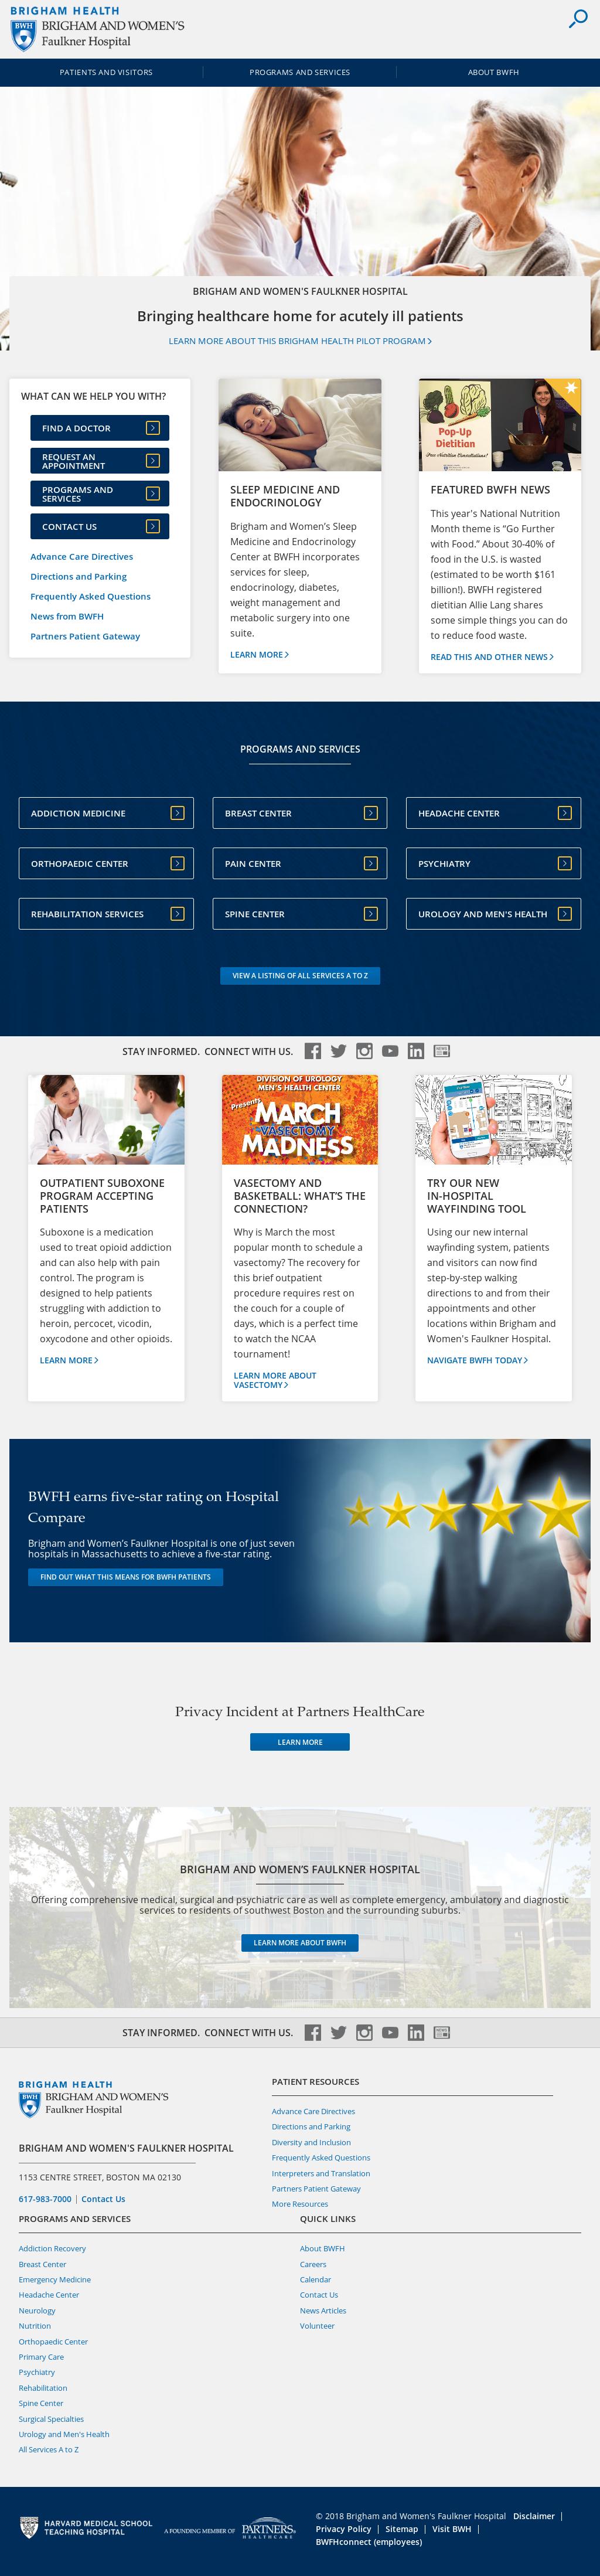 Brigham And Women's Faulkner Hospital Competitors, Revenue